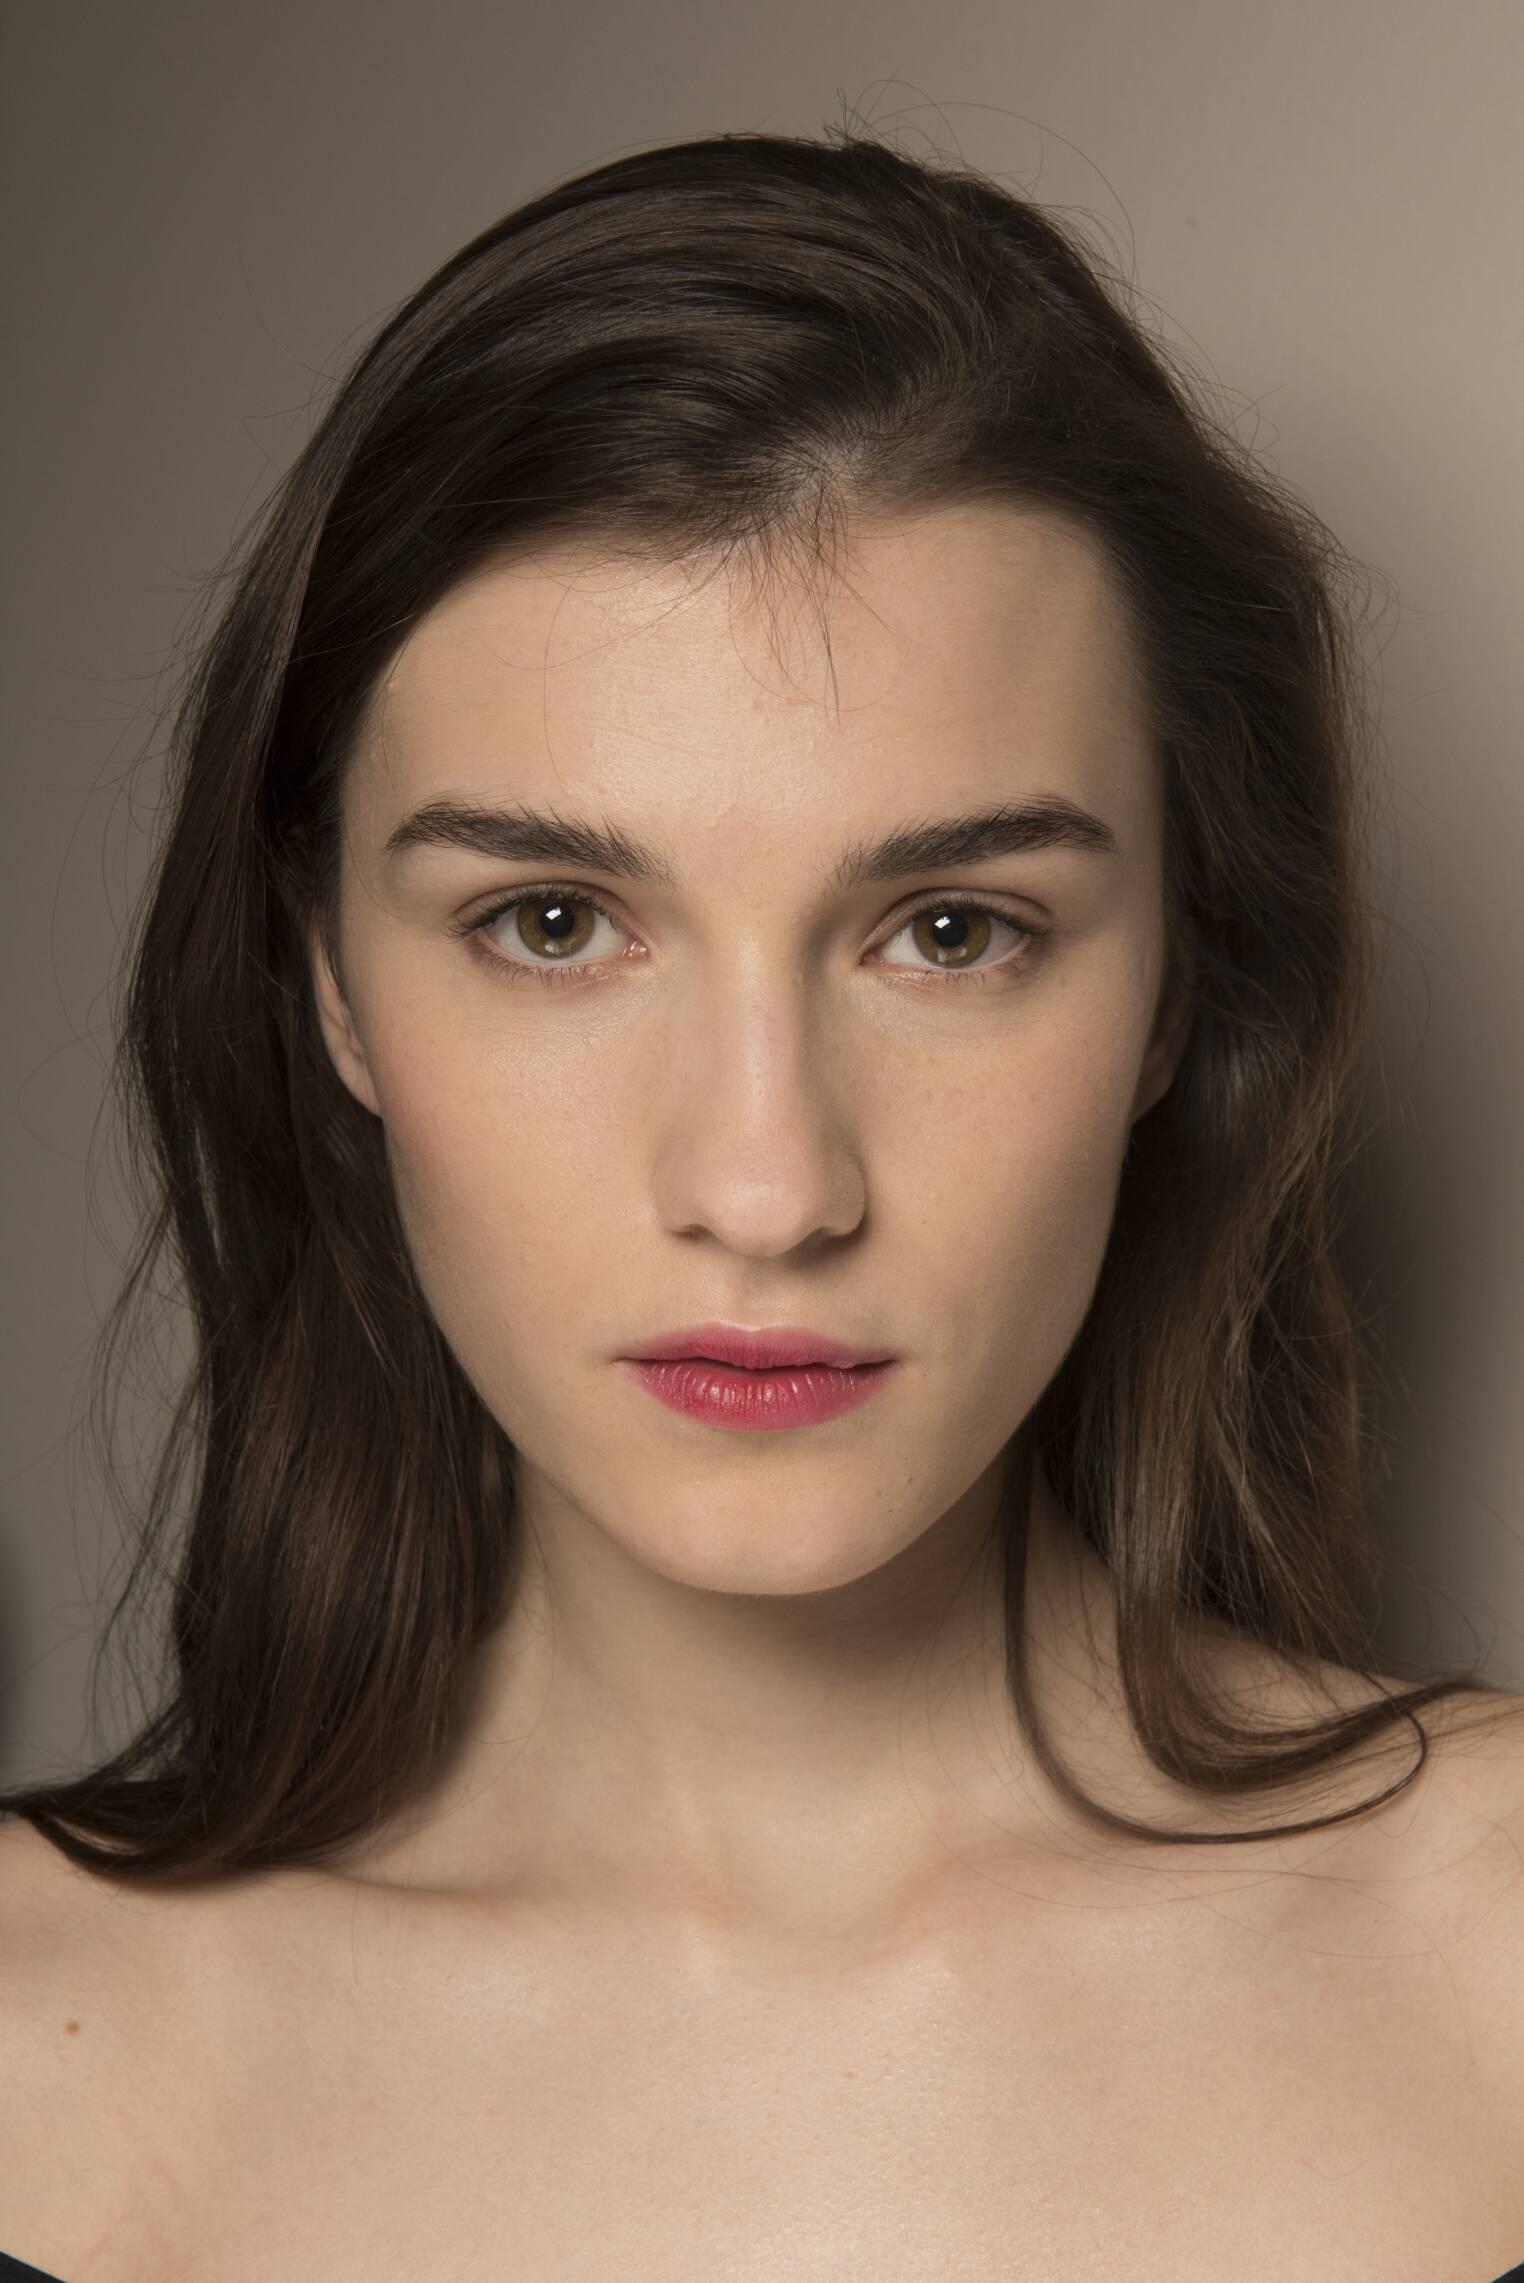 Backstage Alberta Ferretti Woman Model 2018 Portrait